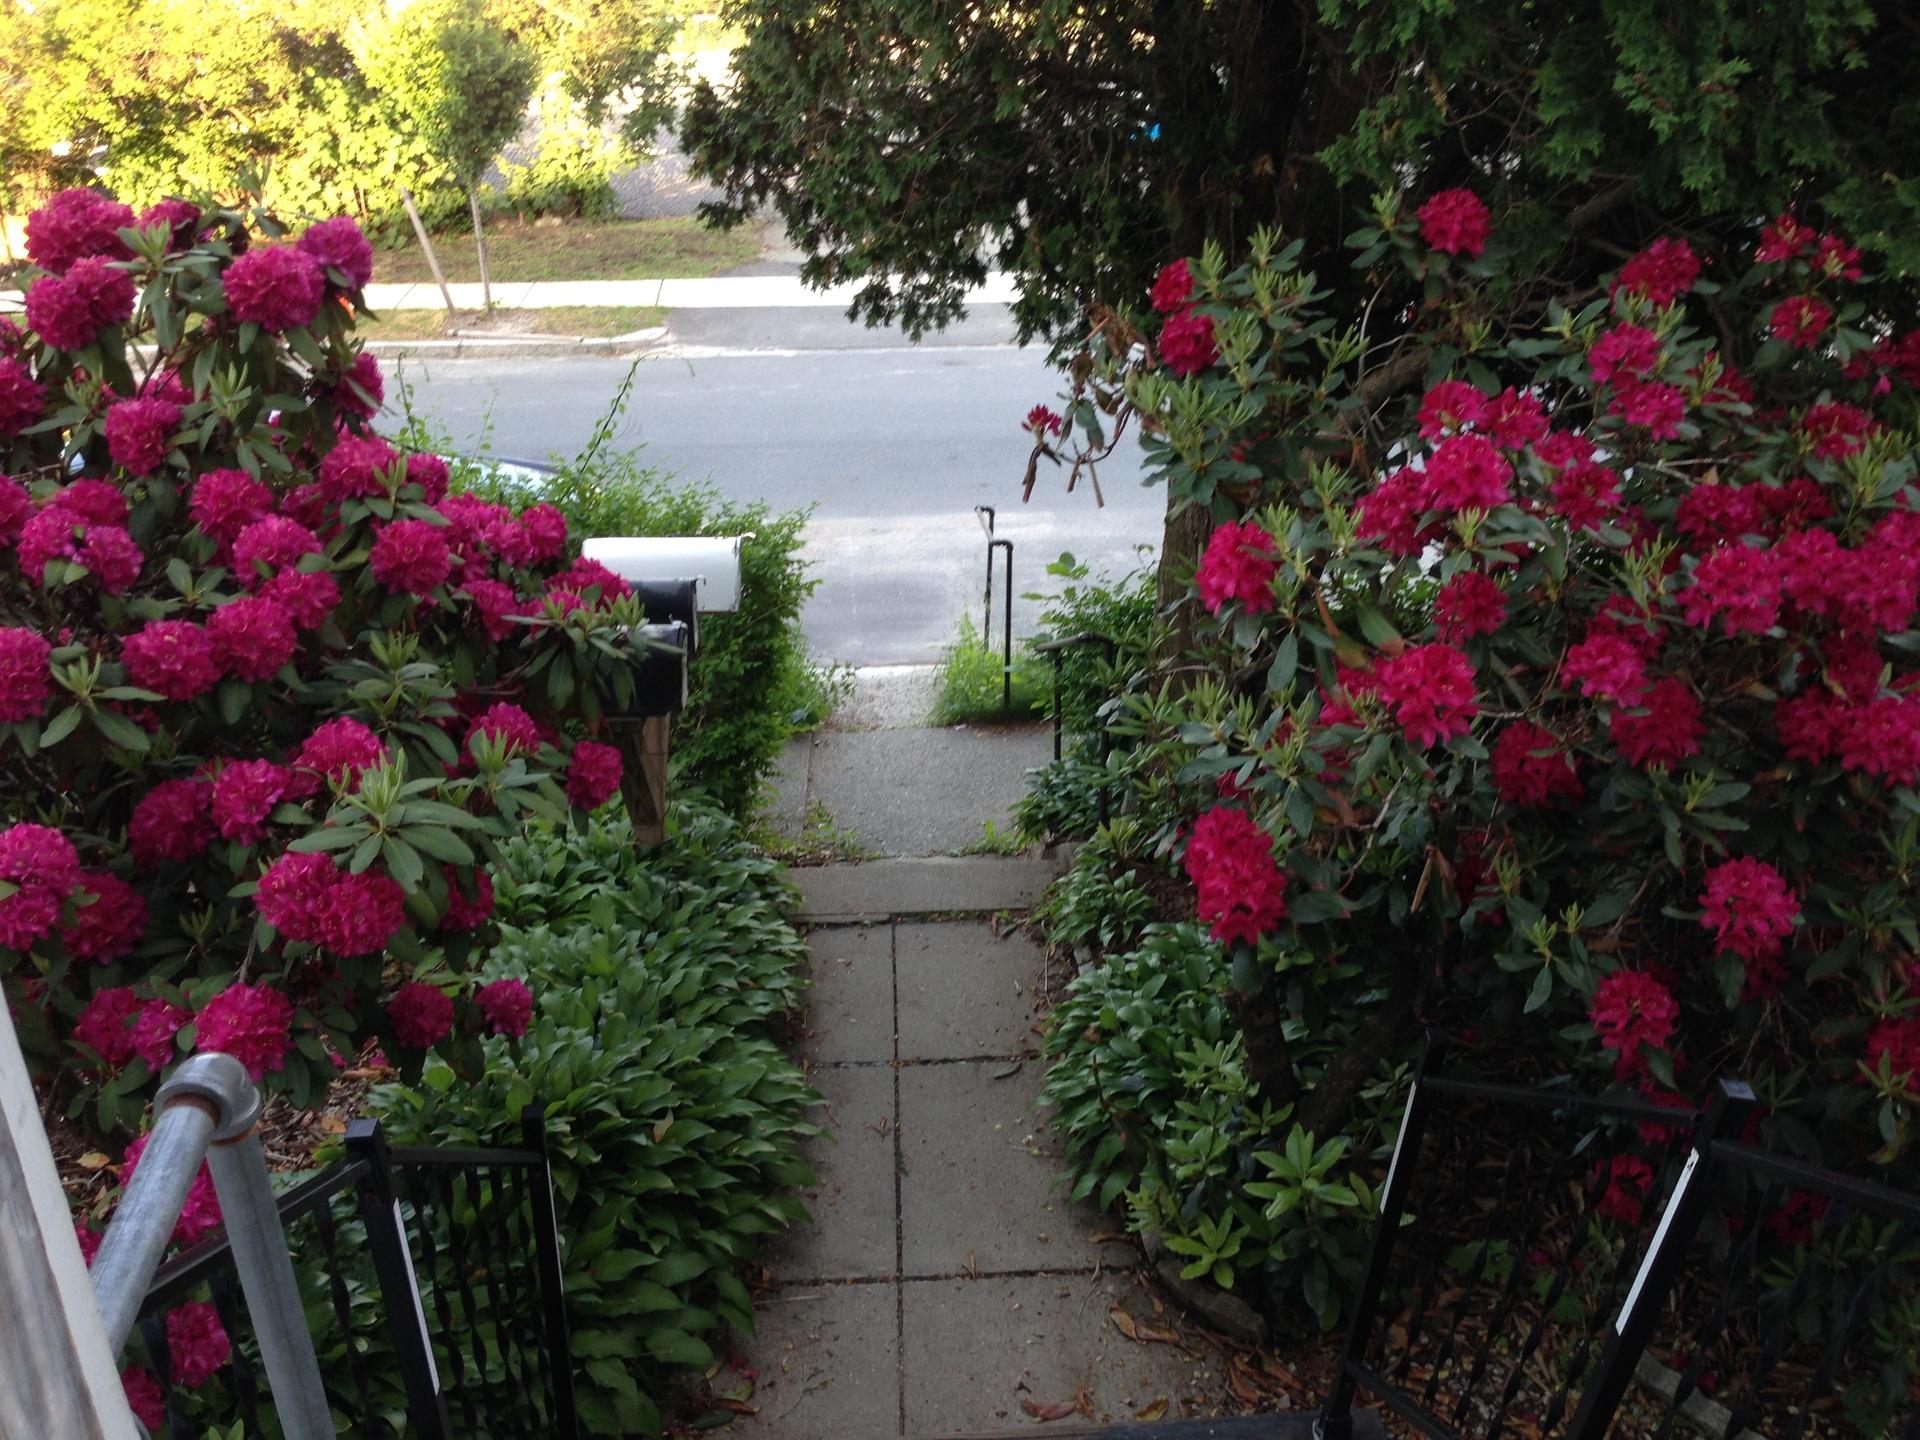 Flowery walkway   jstepien, flower, summer, horticulture